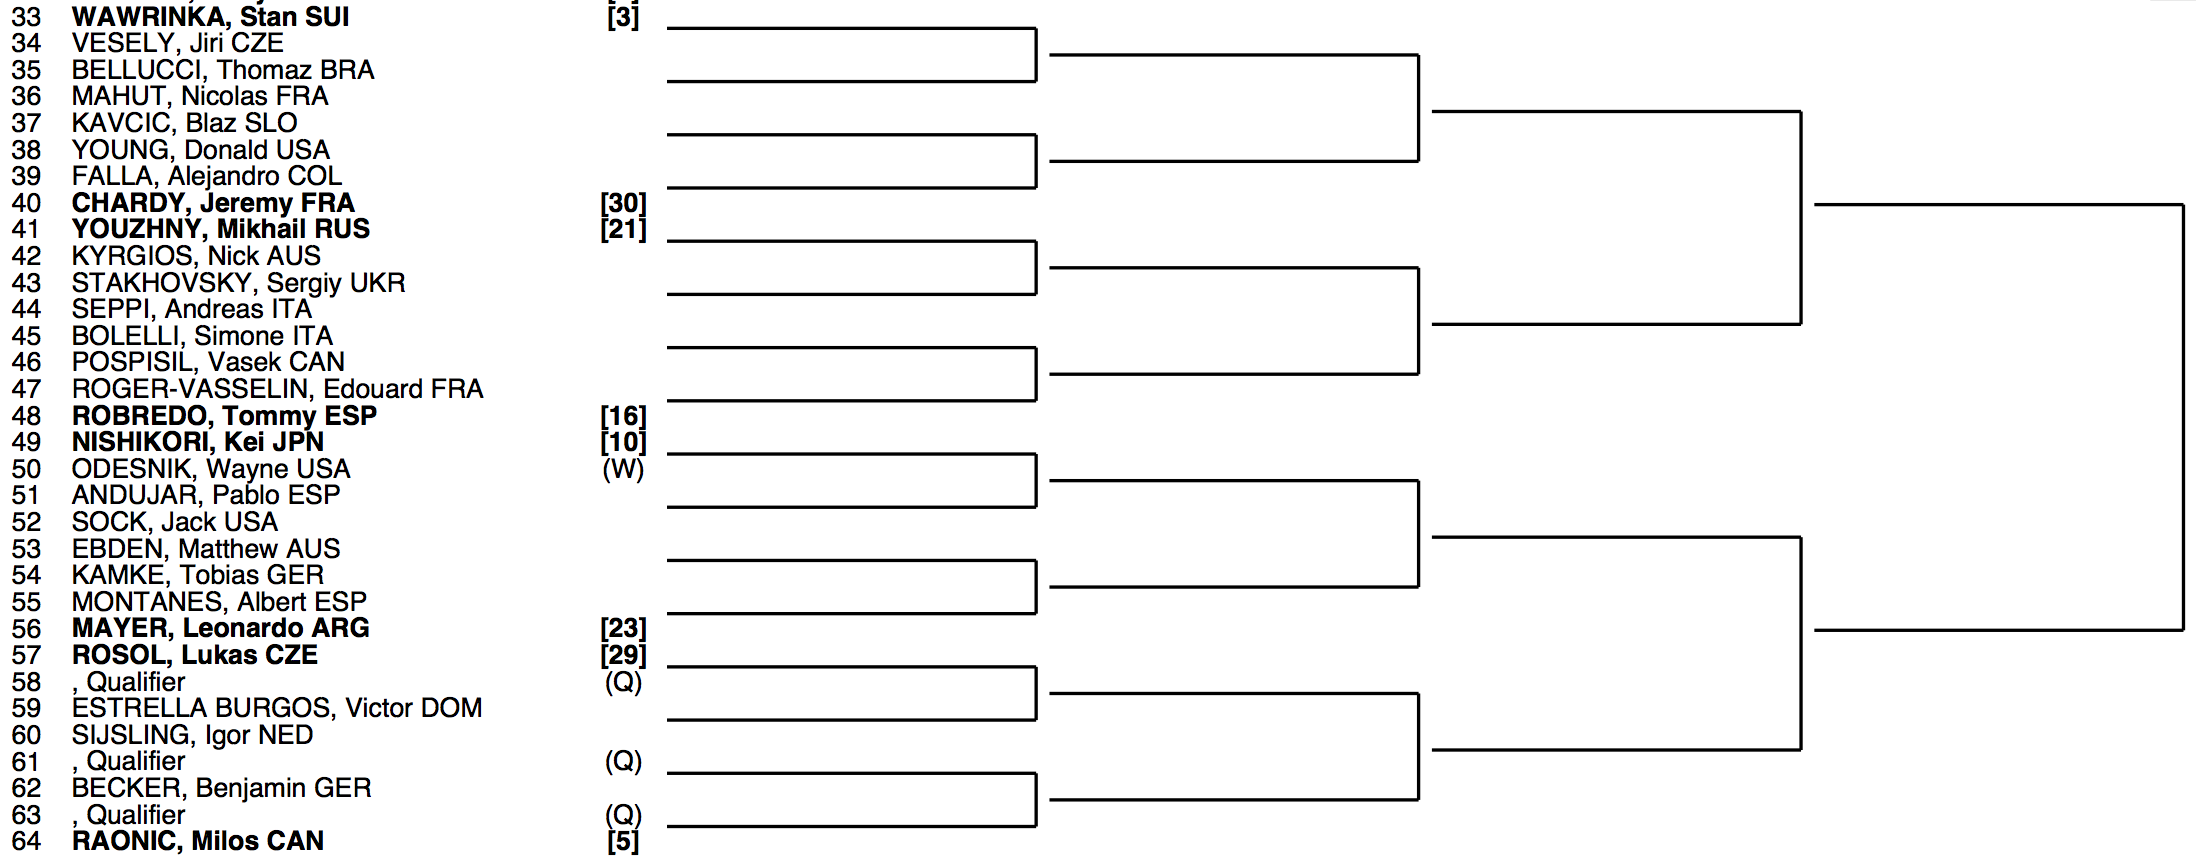 US Open 2014 draw 2:4